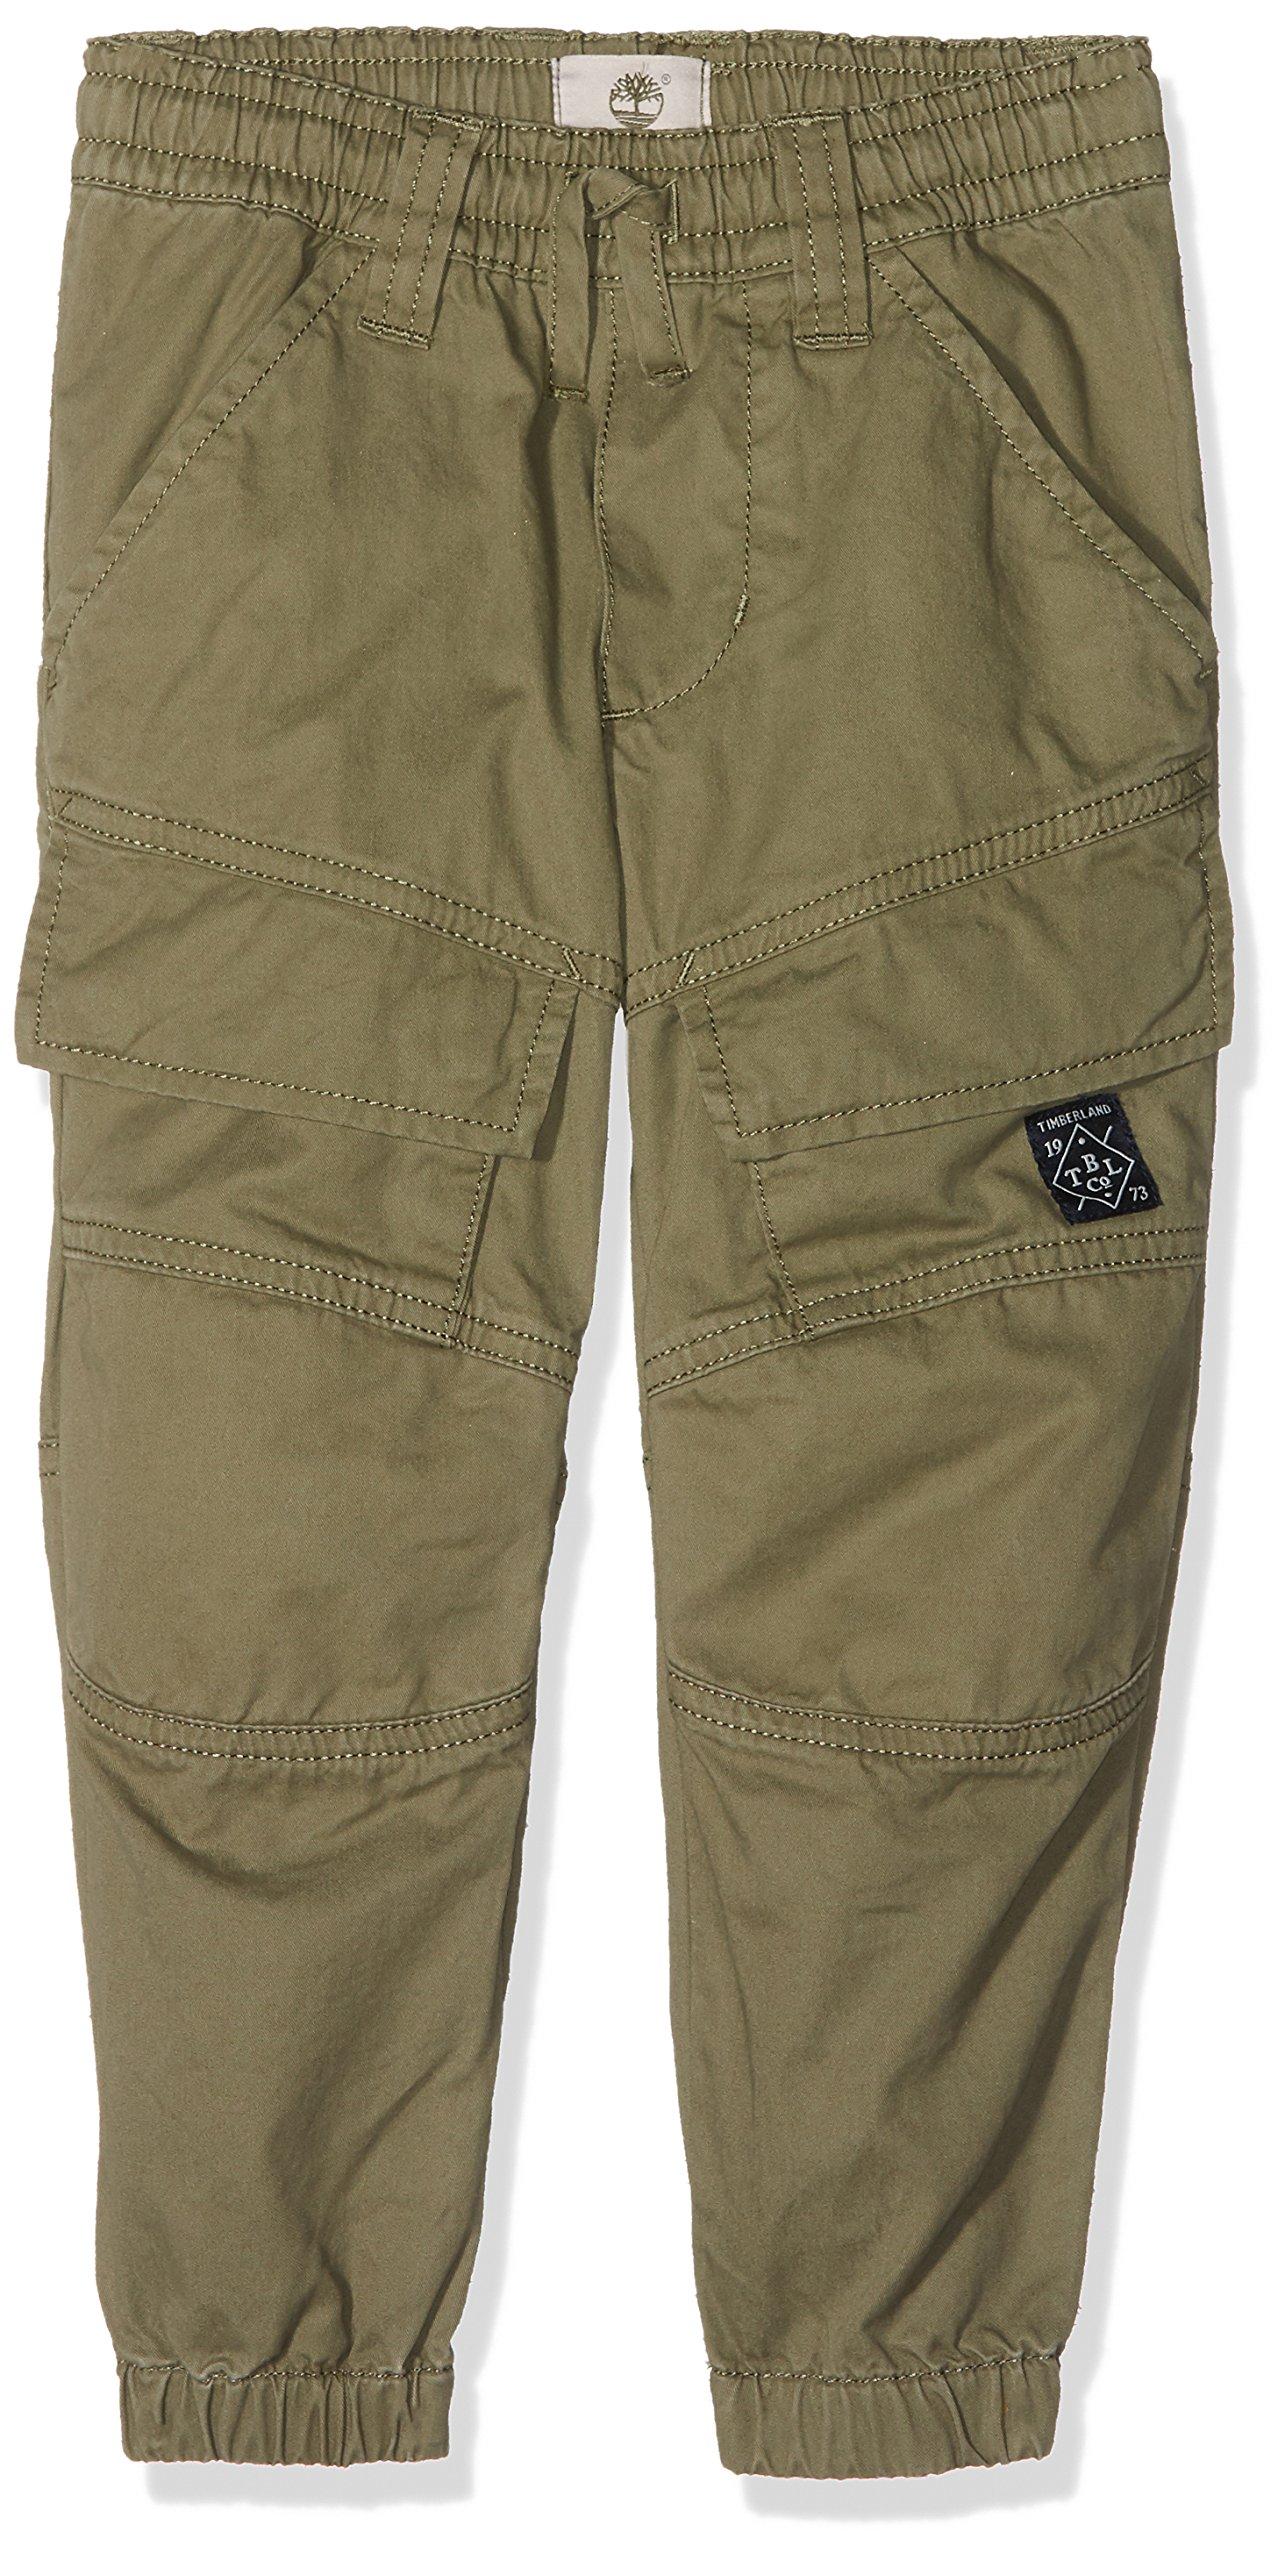 Timberland Pantalon Elastique Niños